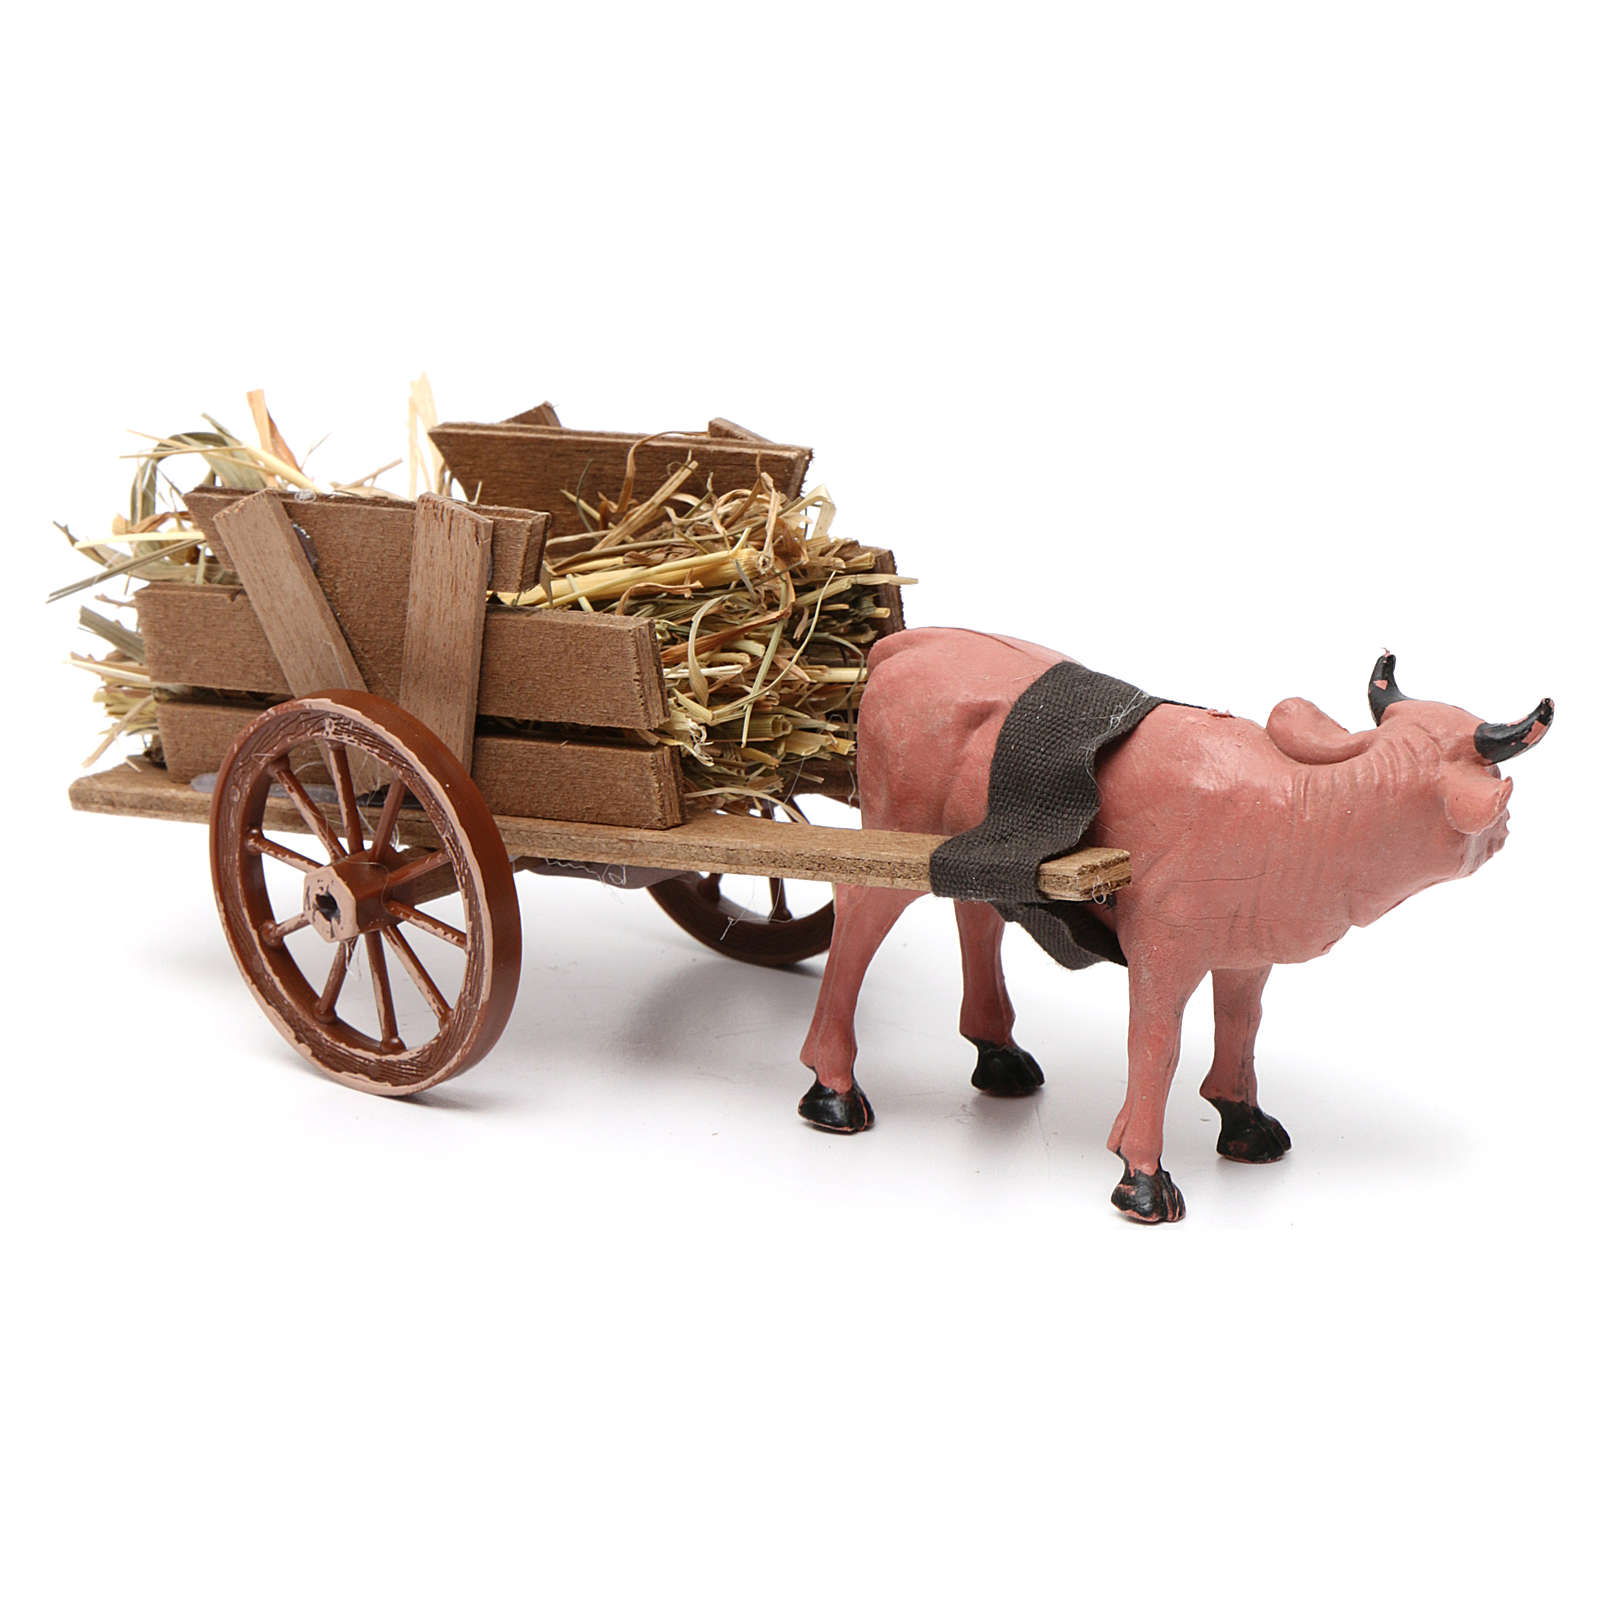 Cart with dark red ox 10x20x10 cm for Nativity Scene 8 cm 3